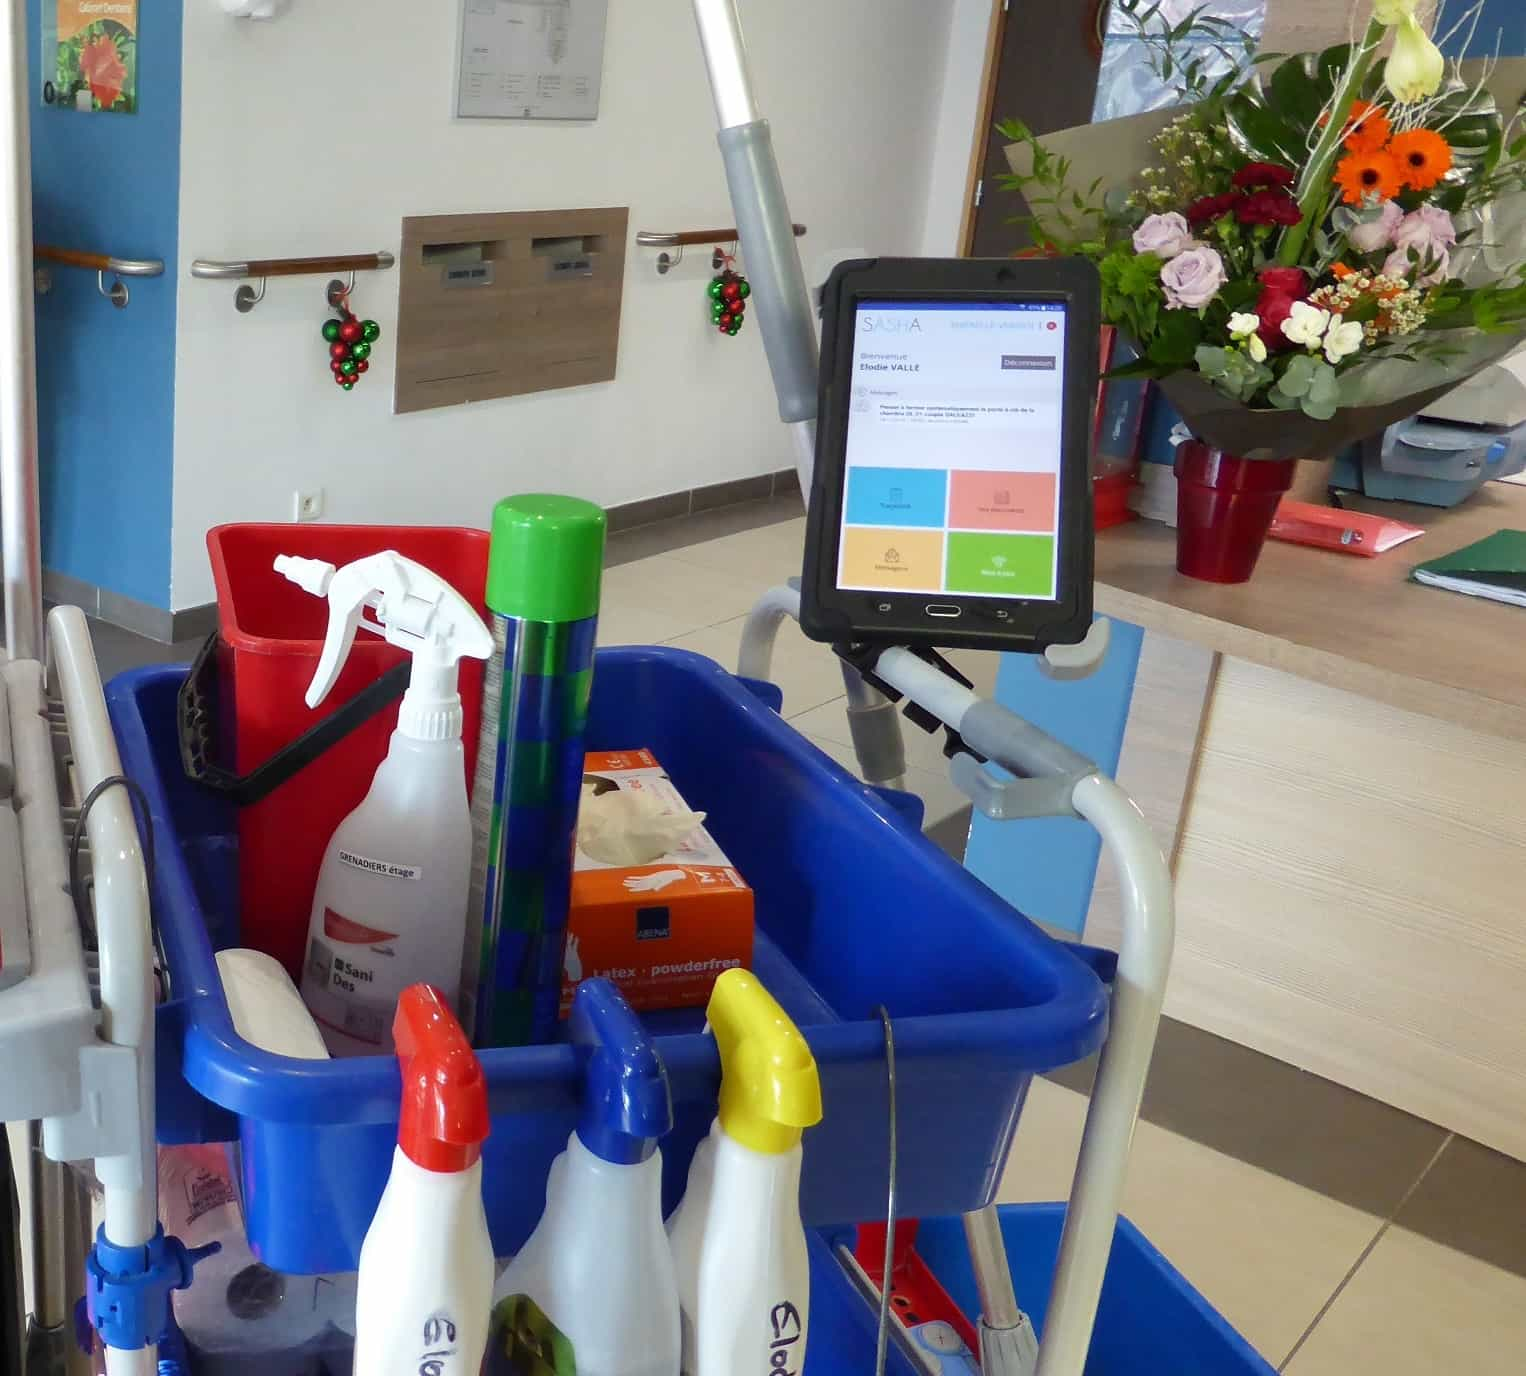 tablette application logiciel SASHA fixée fixation chariot bio nettoyage antivol